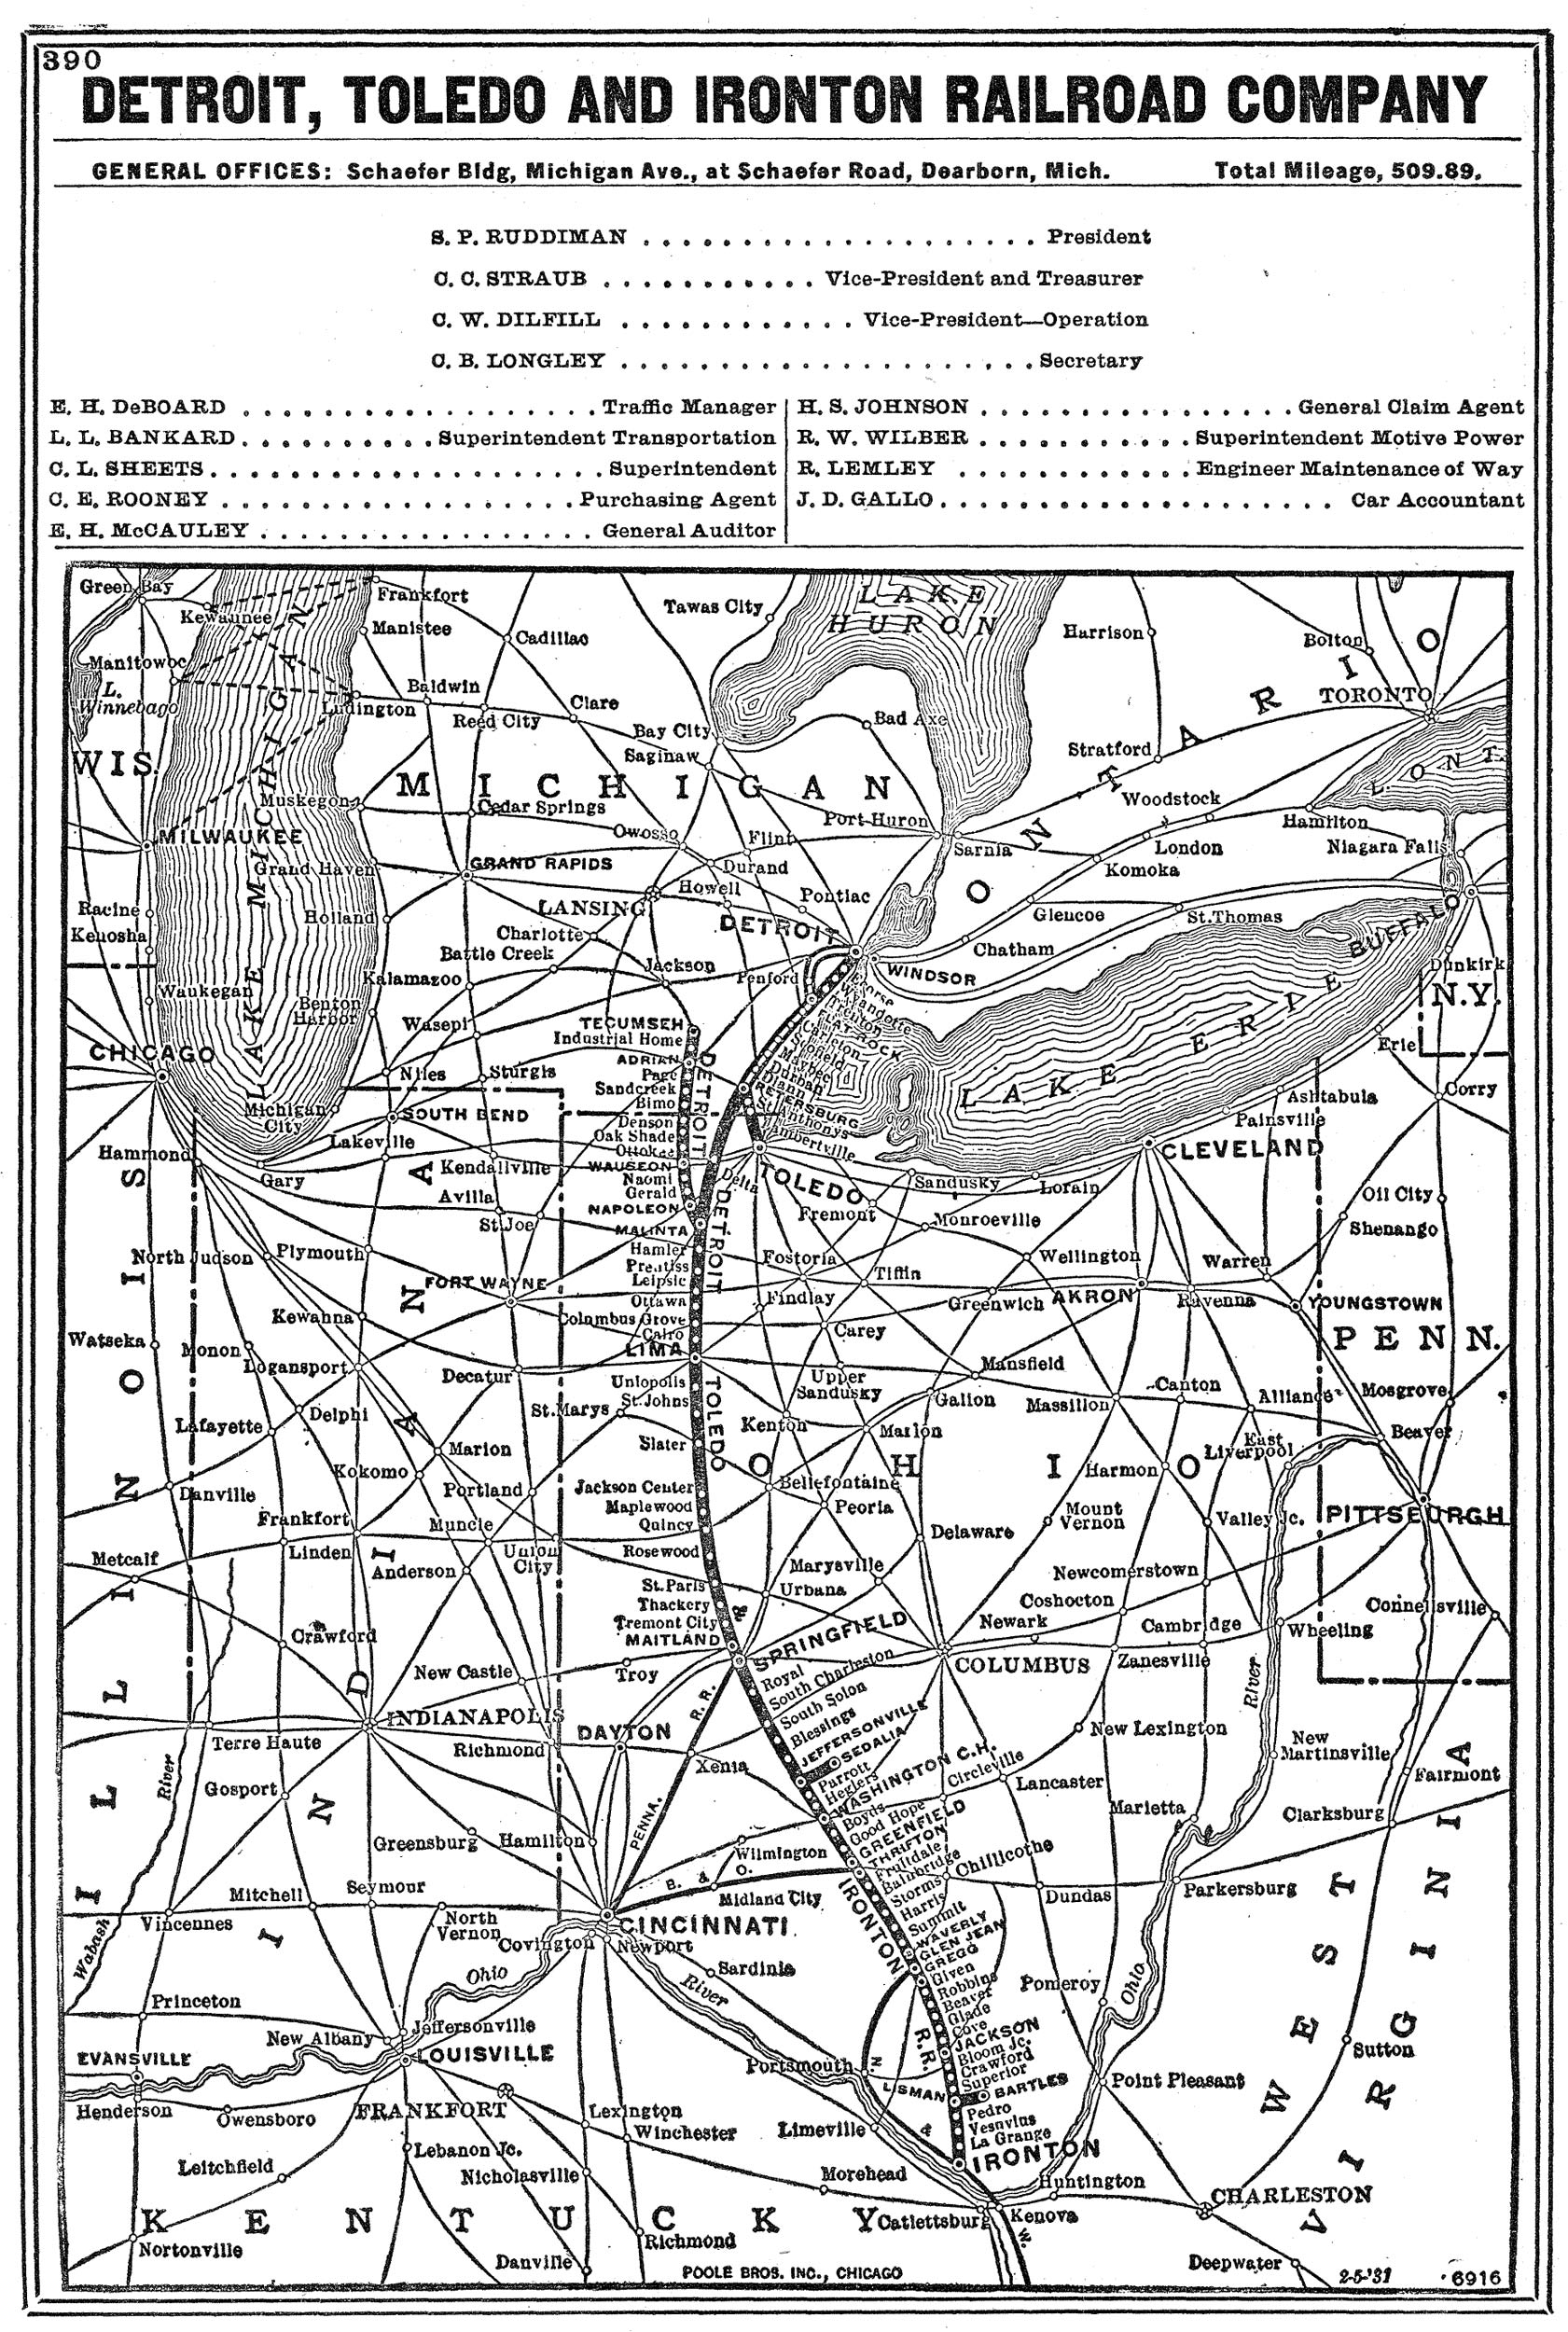 Transportation Company - Detroit Toledo & Ironton - Railroad